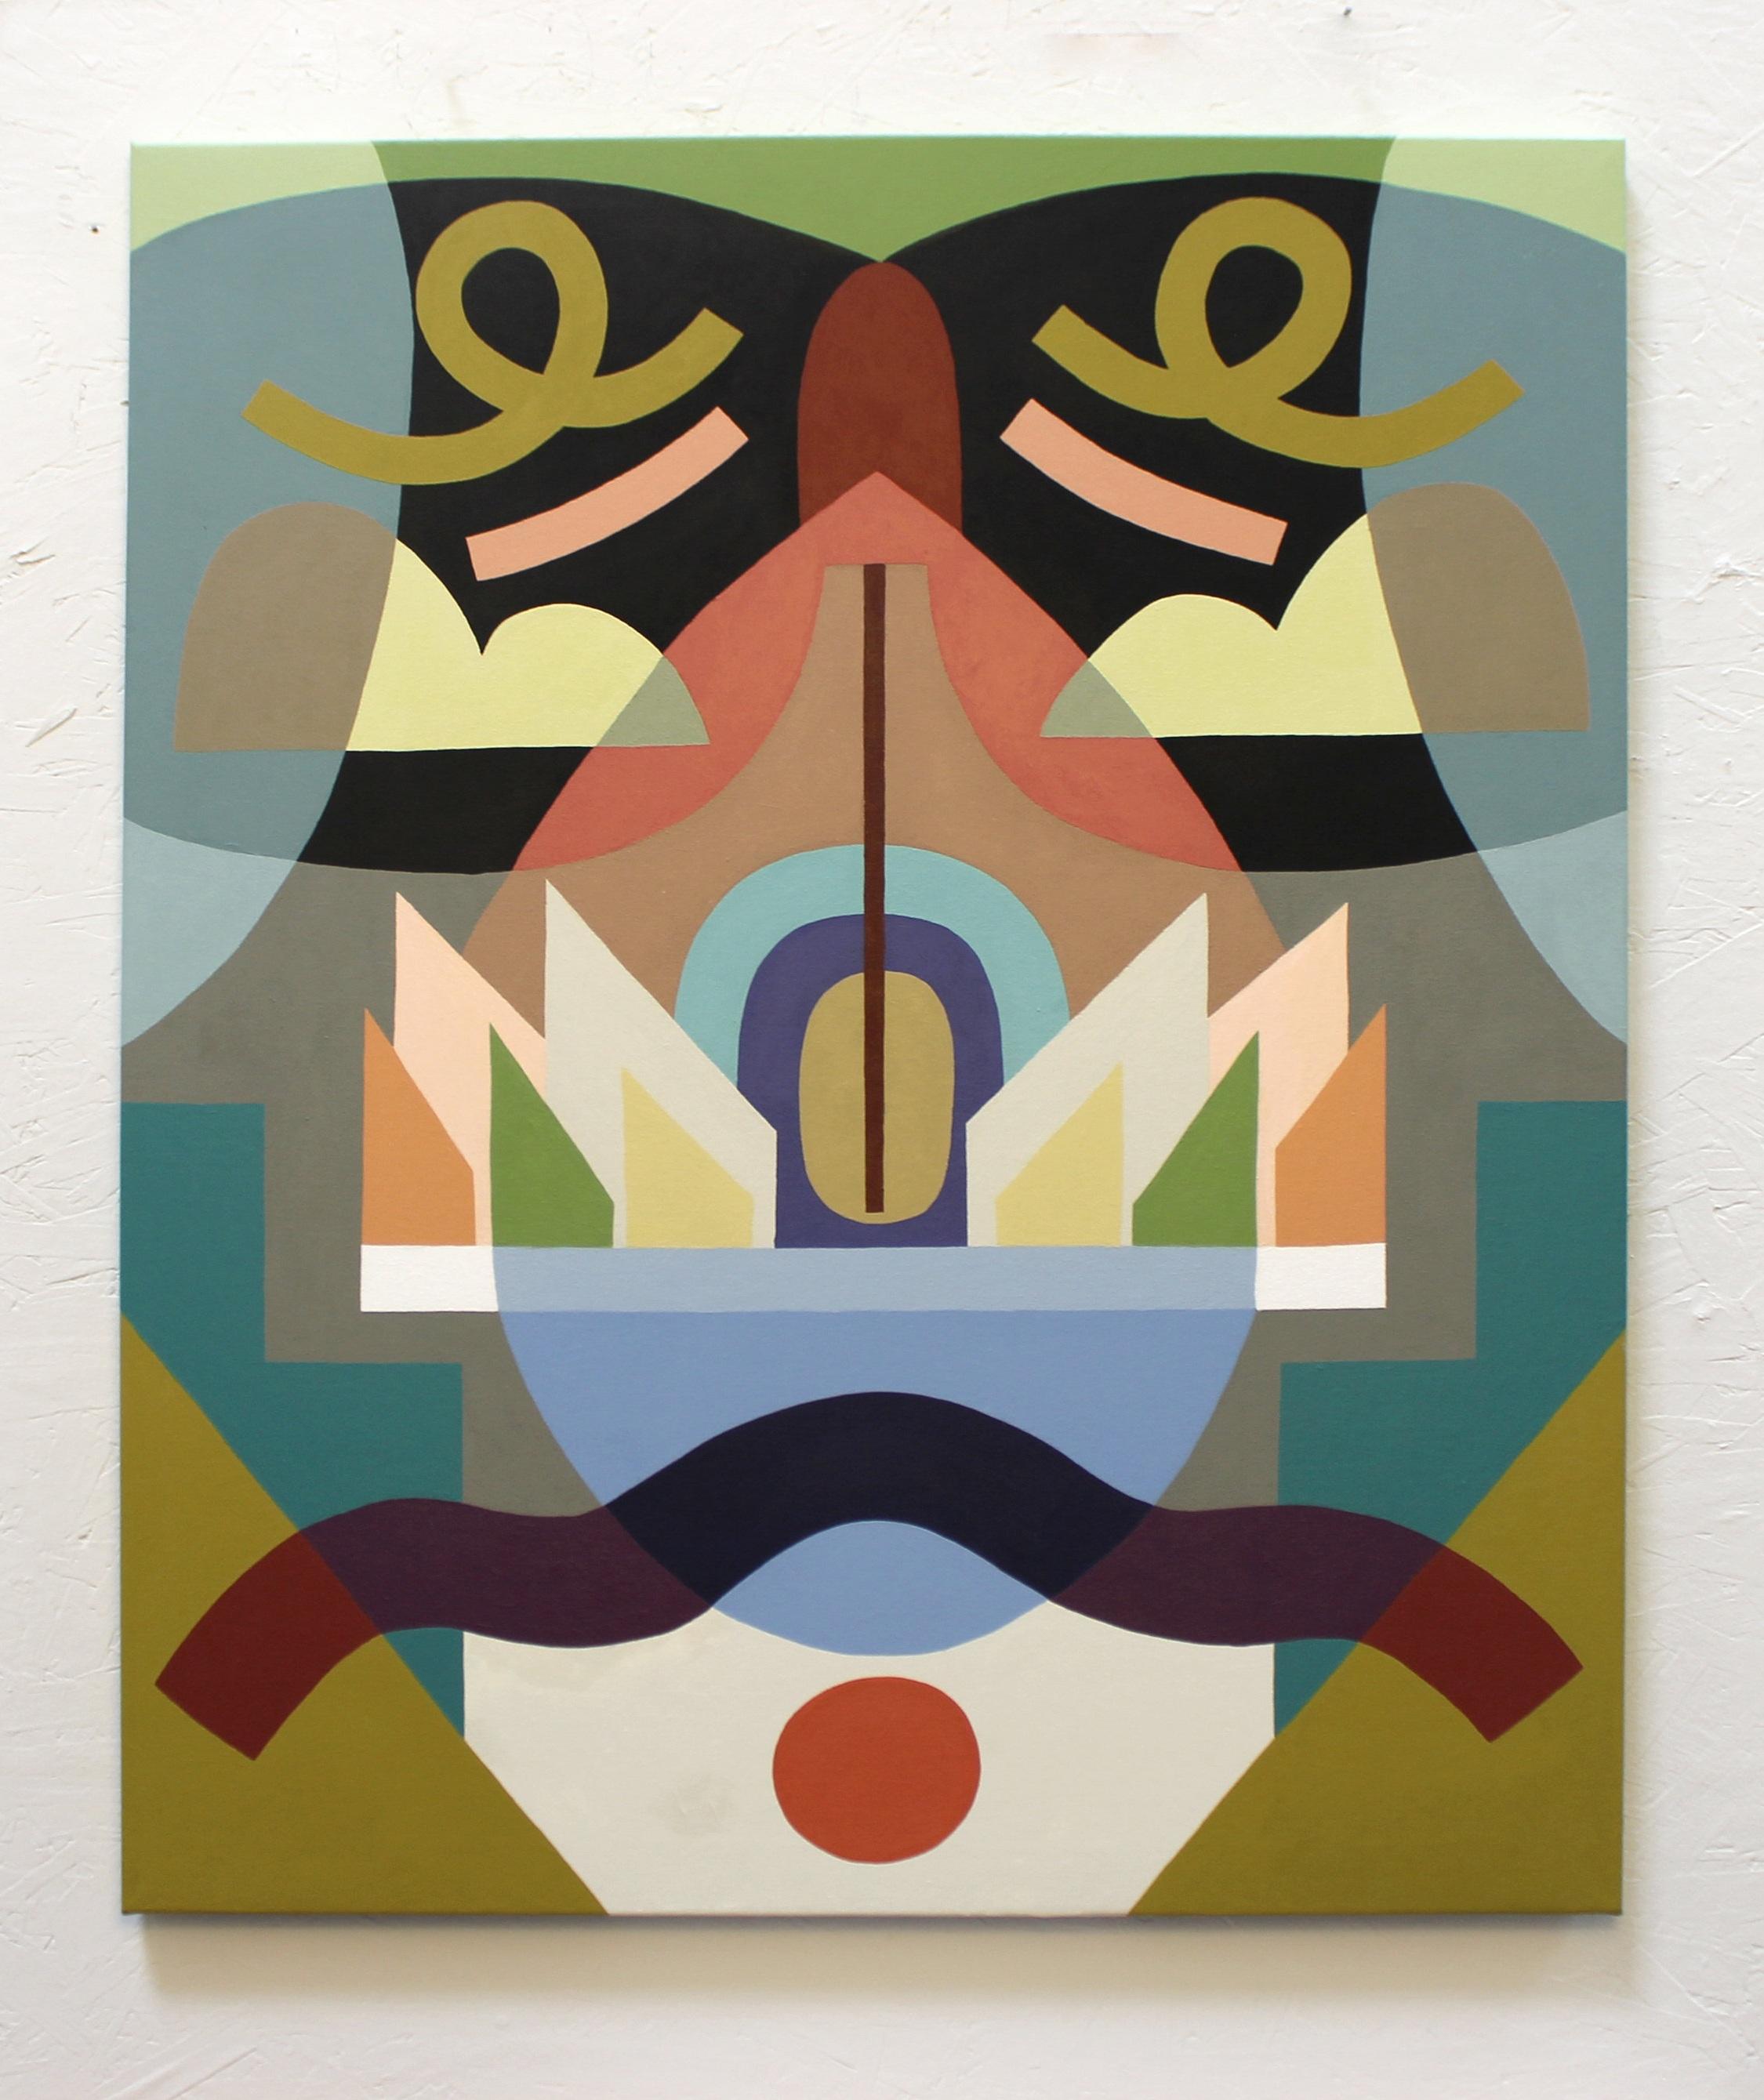 Opposite Symmetry #2  Acrylic on canvas. 2018